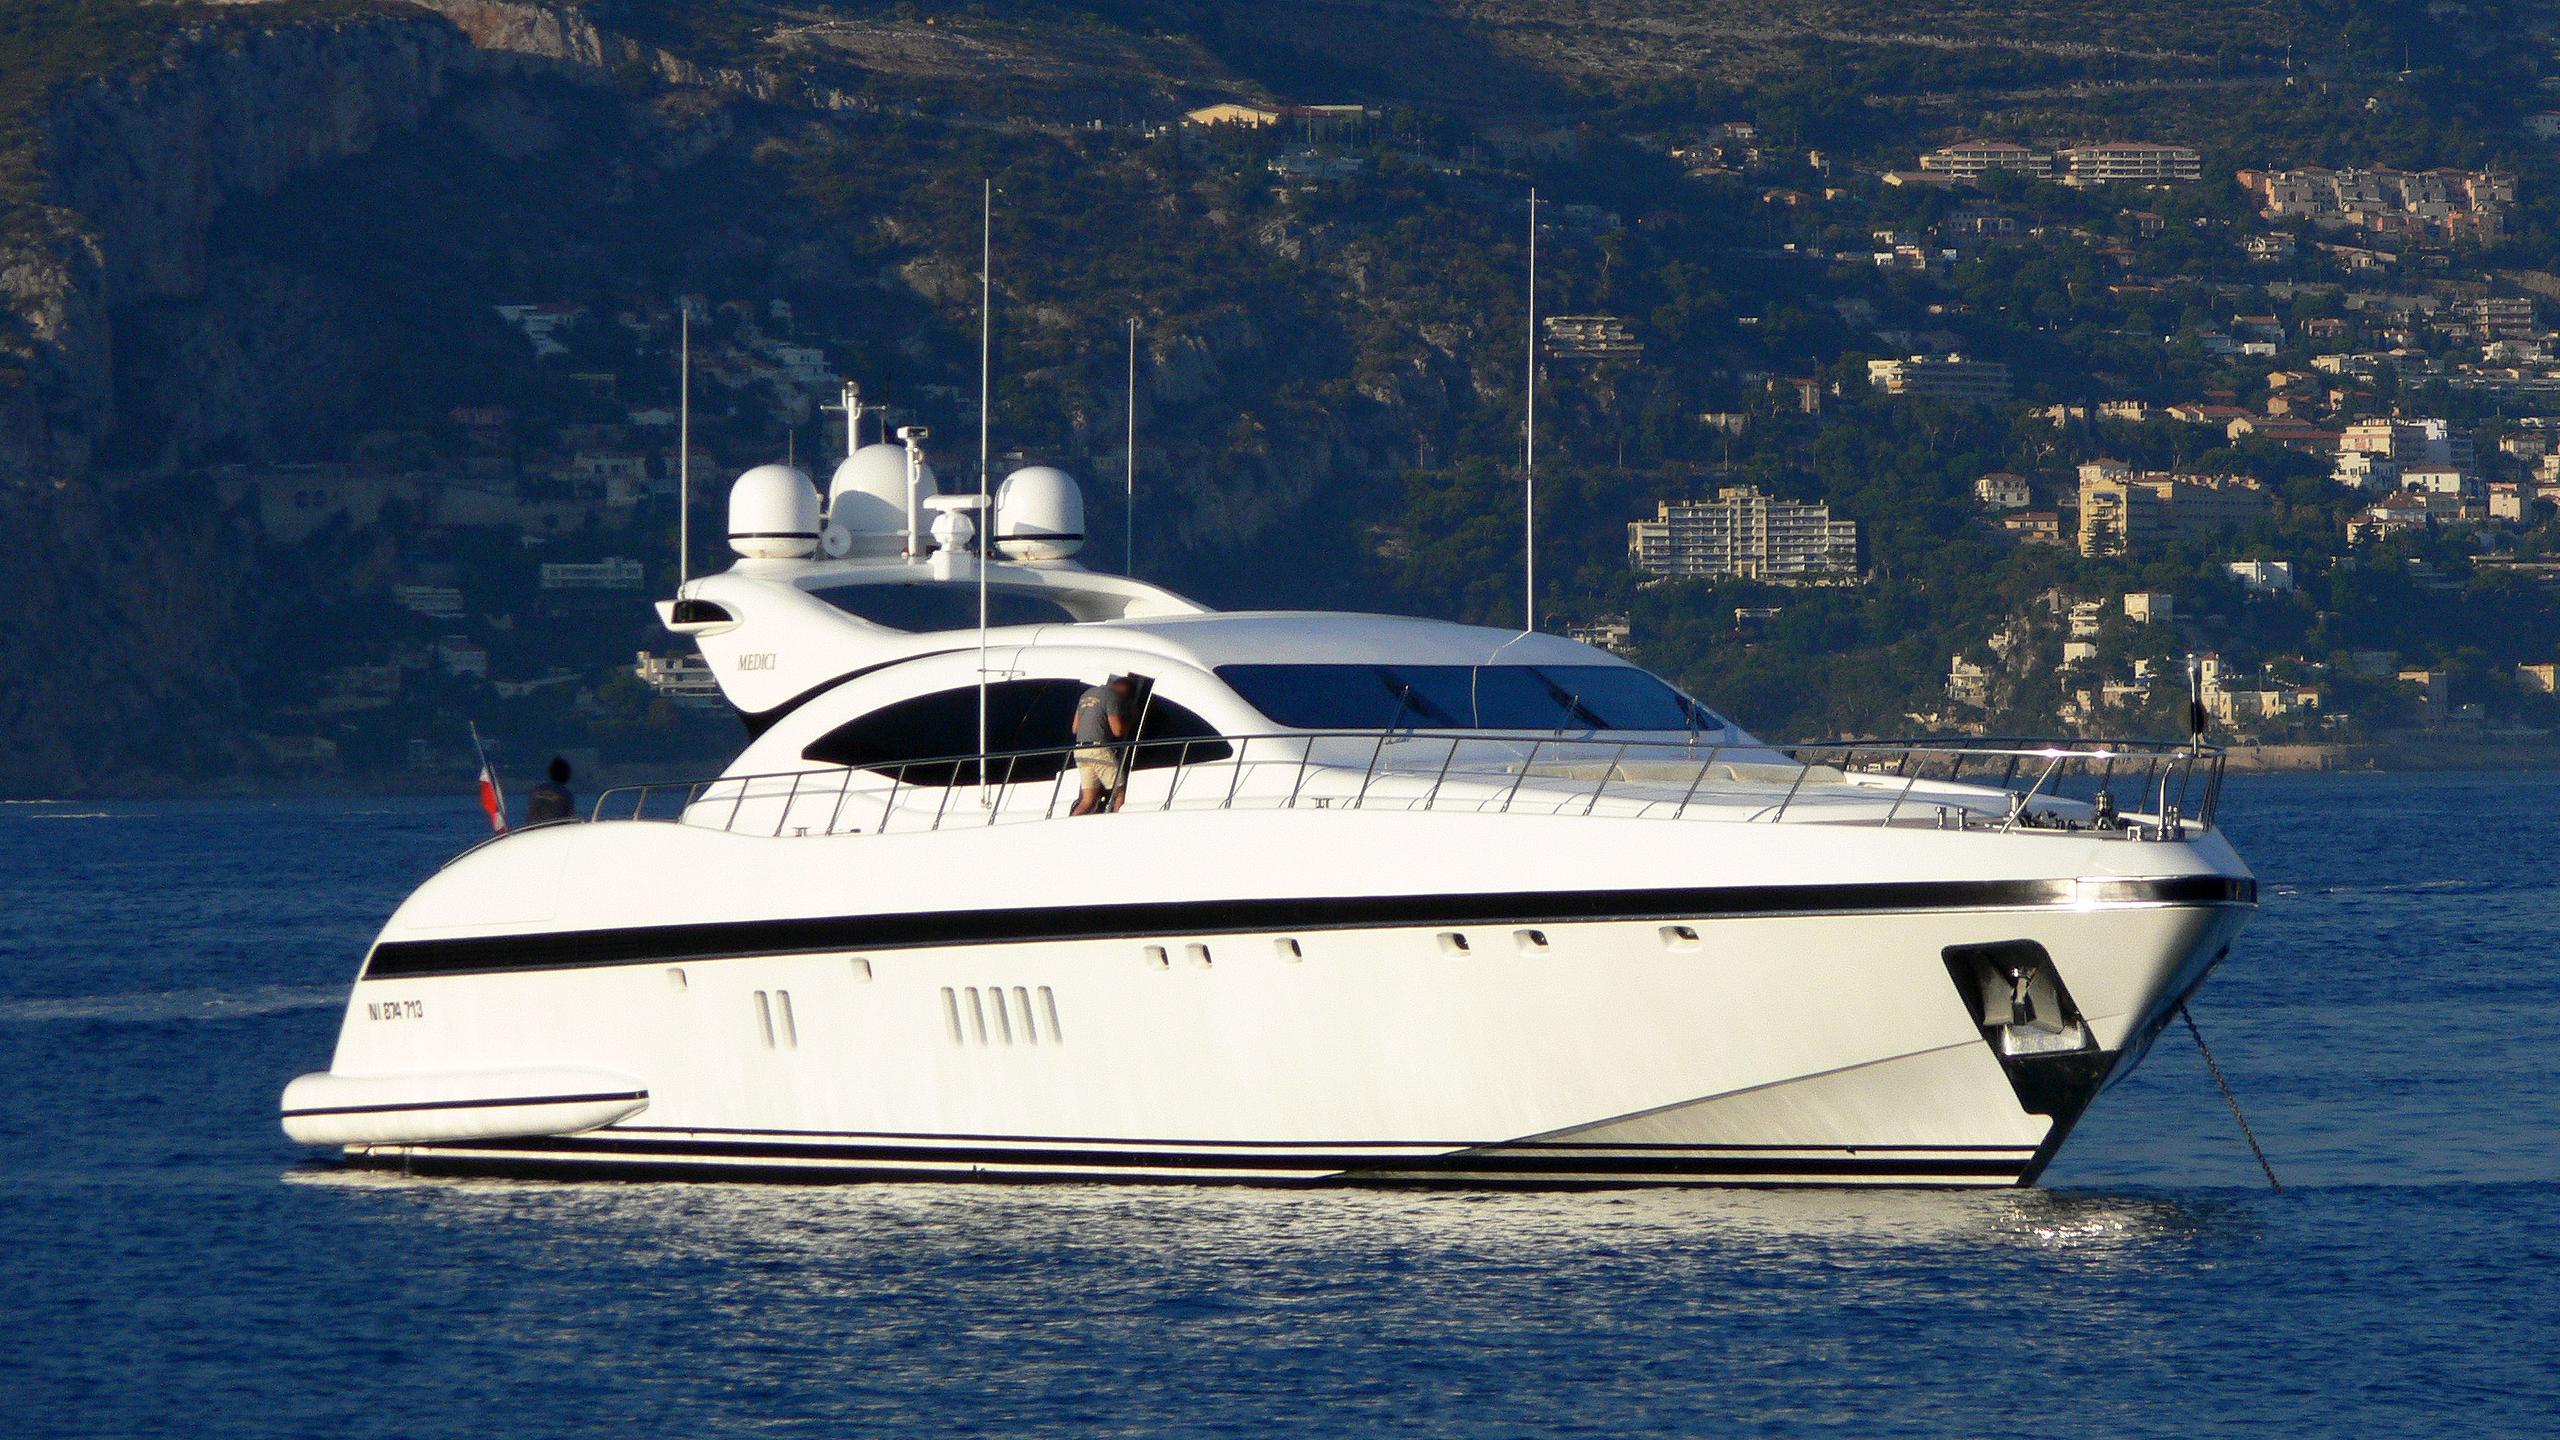 naisca-v-motor-yacht-overmarine-mangusta-108-sport-half-profile